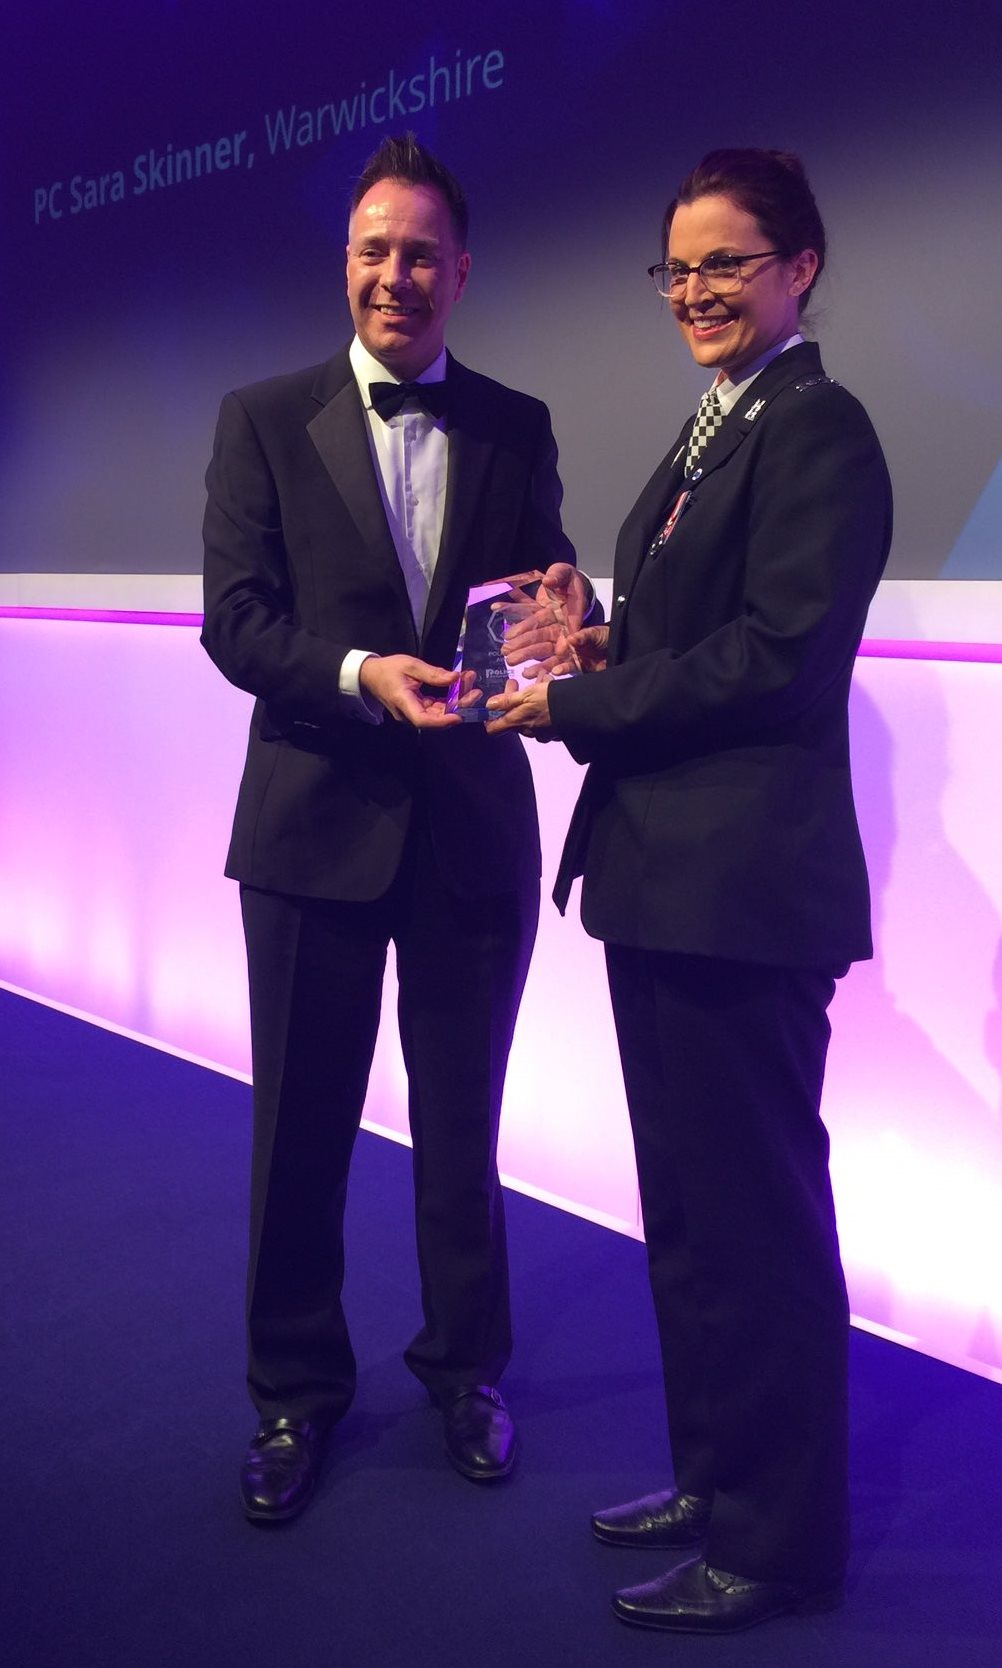 PC Sara Skinner receiving the Midlands Police Bravery award